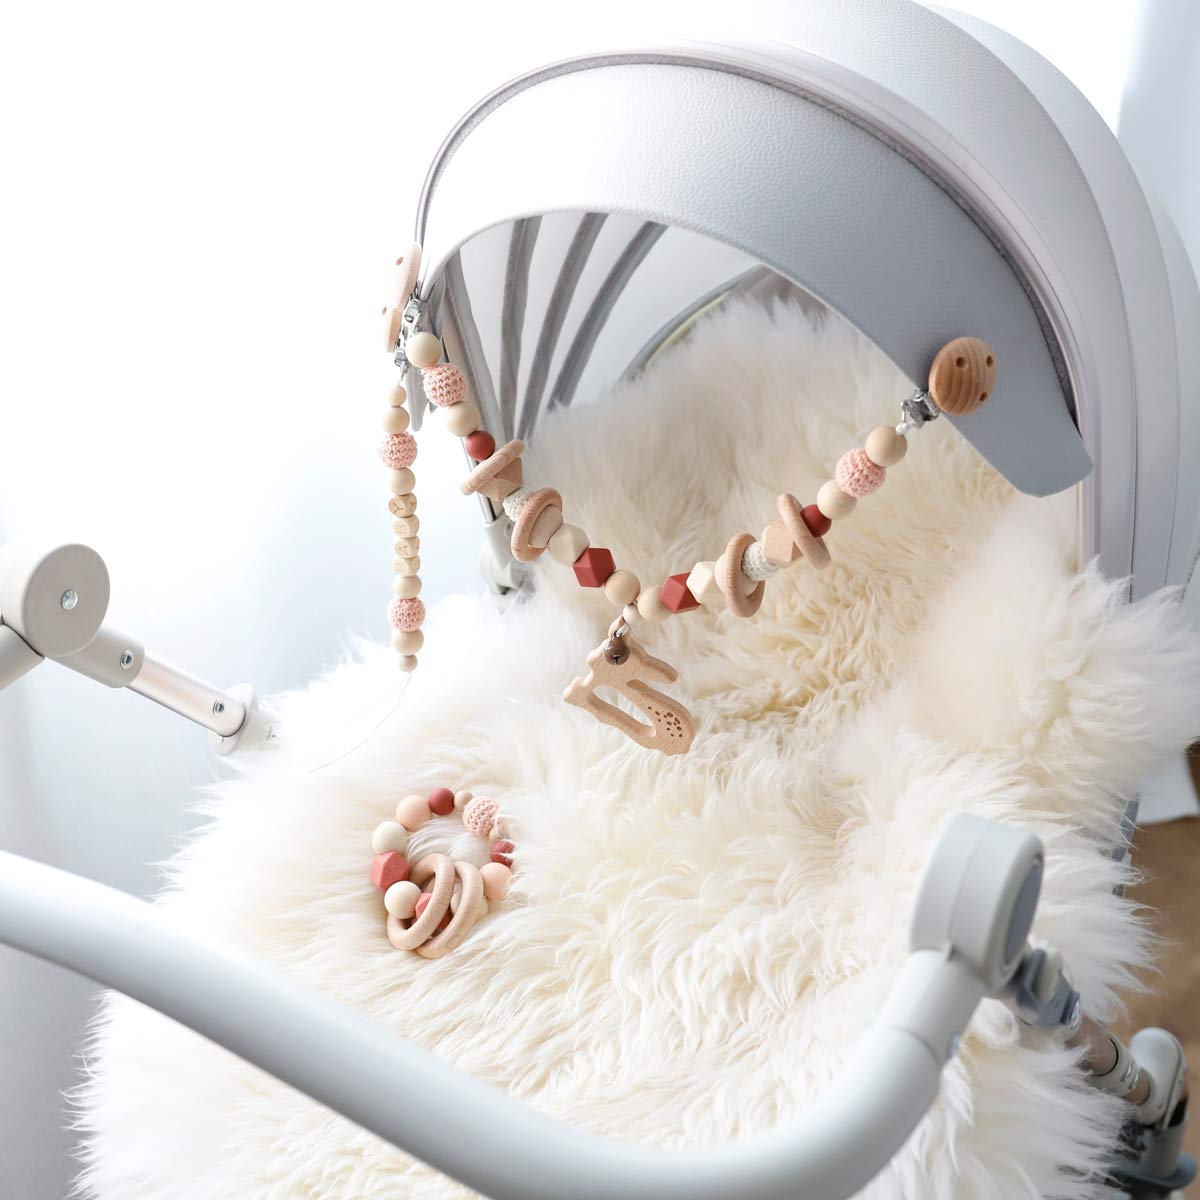 Mamimami Home 3PC actividades colgar juguetes del cochecito de beb/é juguetes asiento cochecito juguete con campana de timbre chupetero cadena chupetes juguetes madera montessori